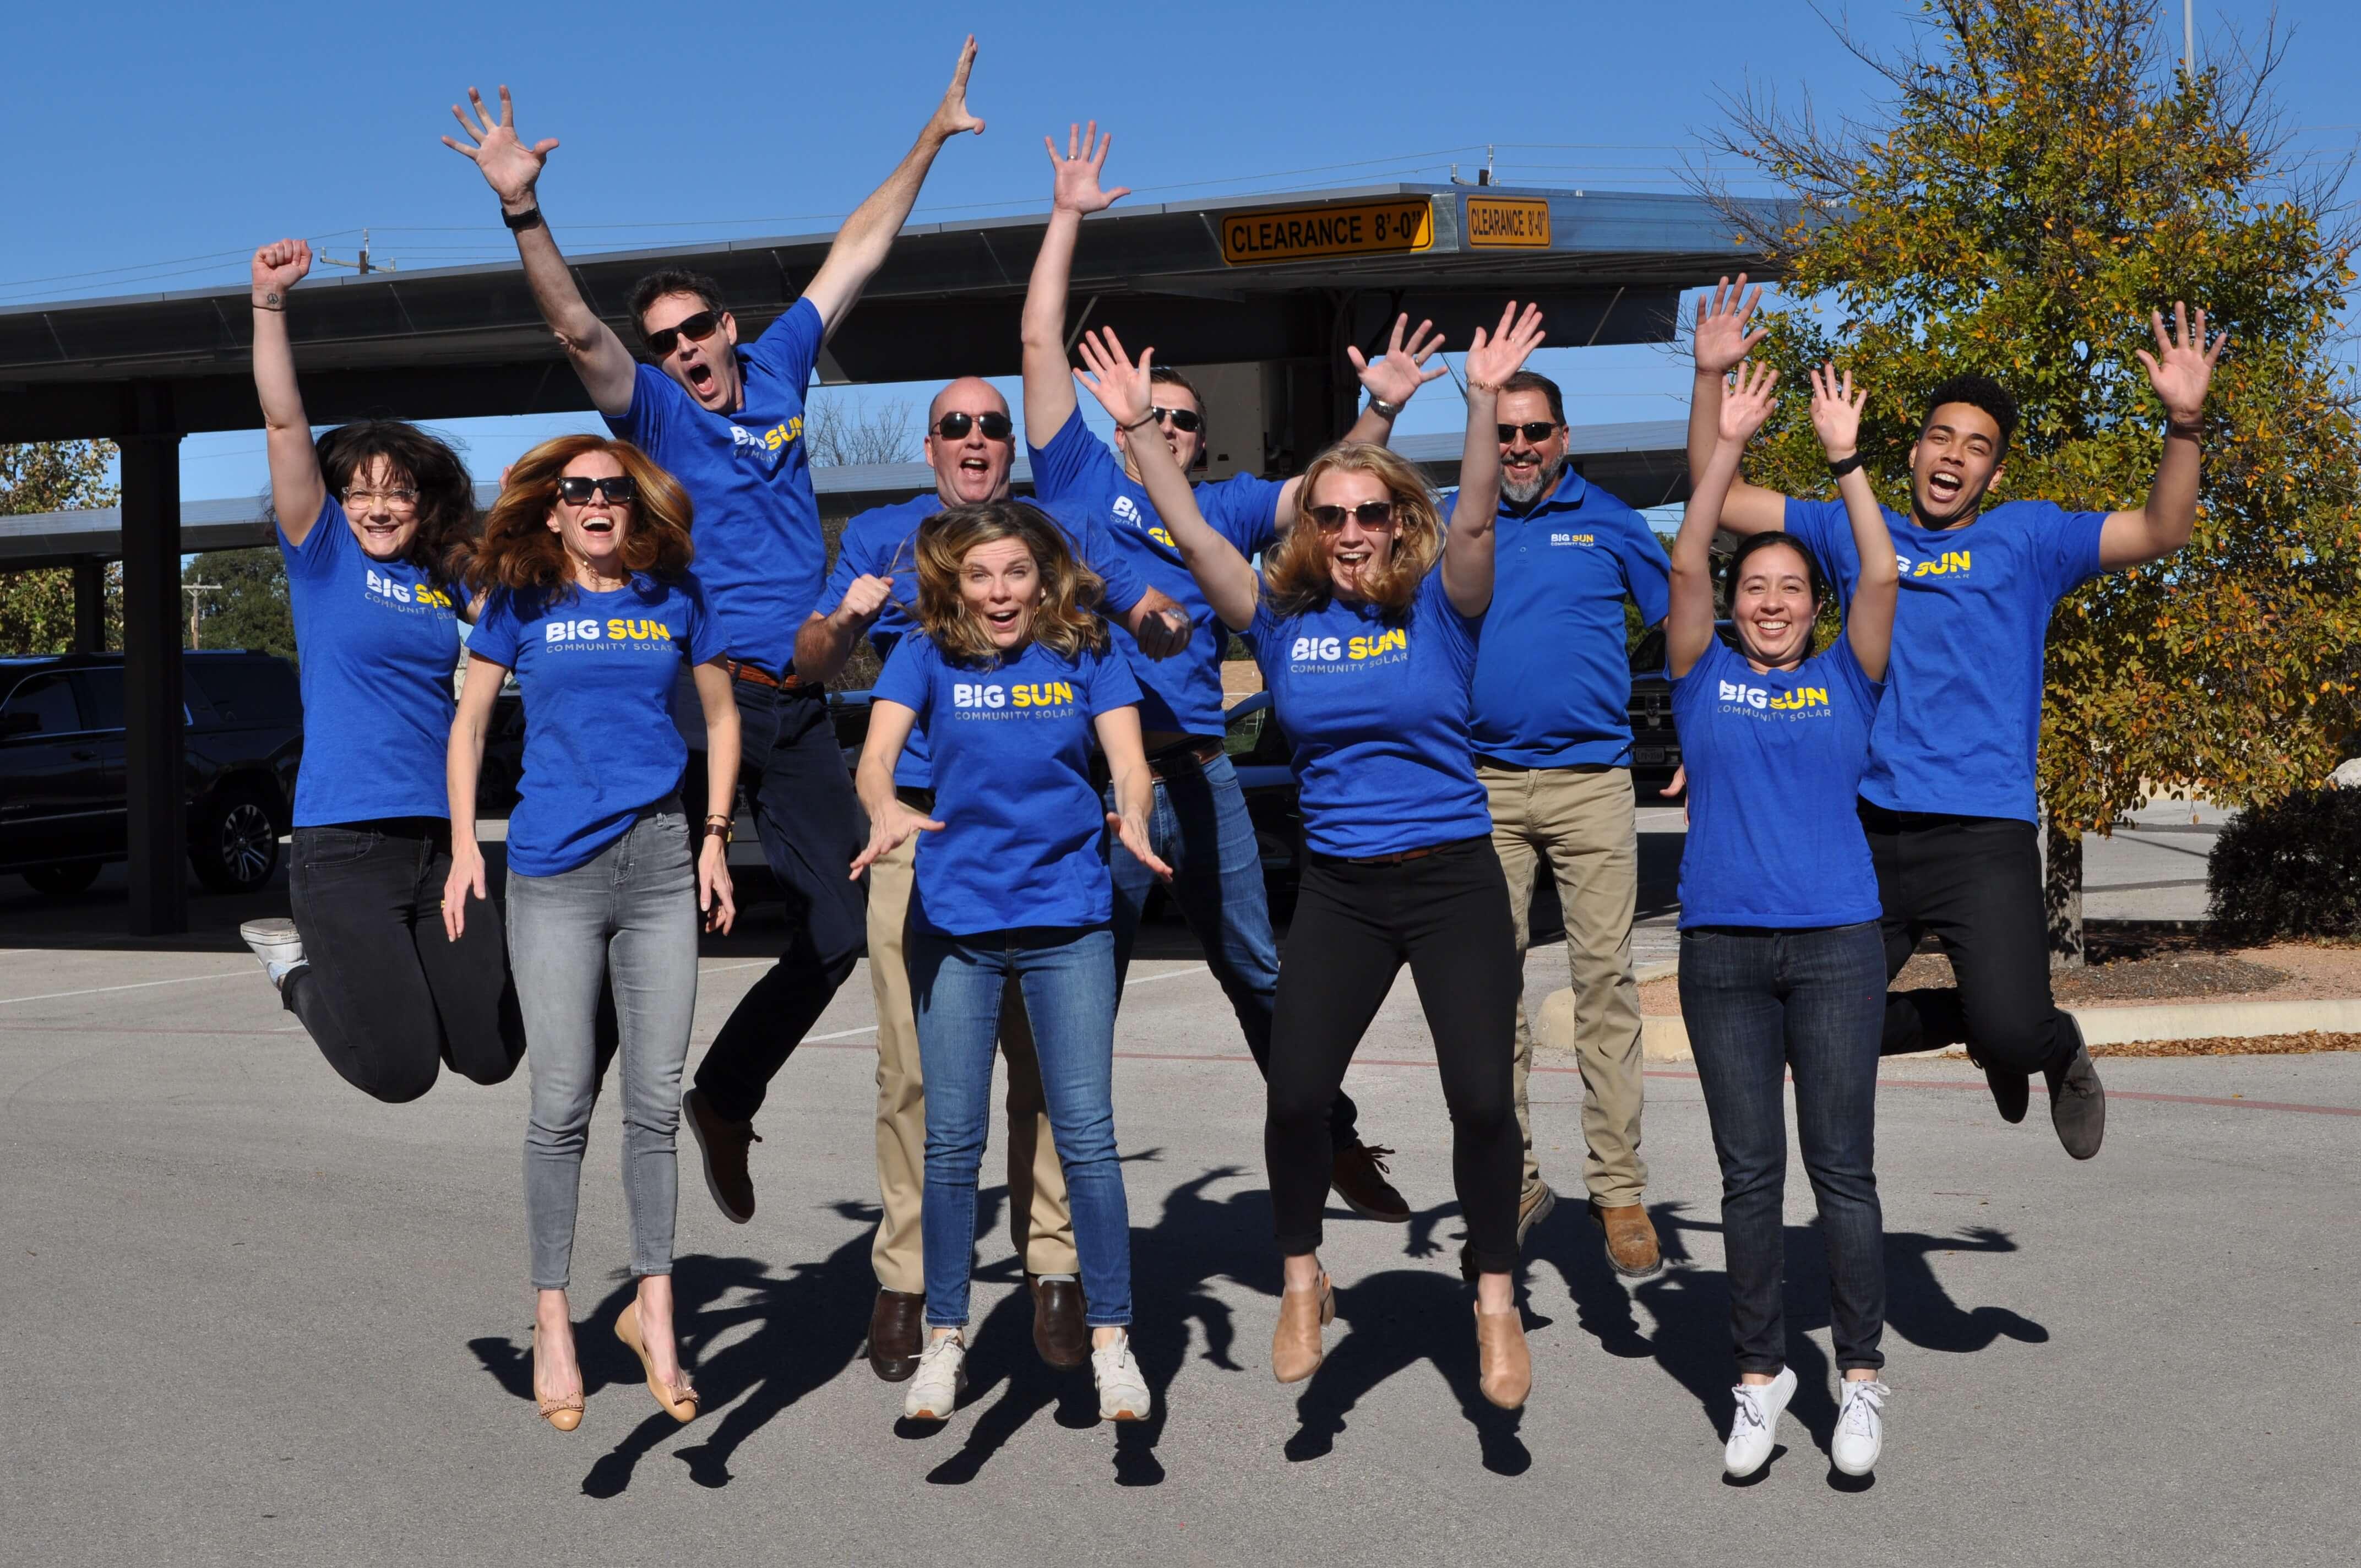 Big Sun Solar team jump photo